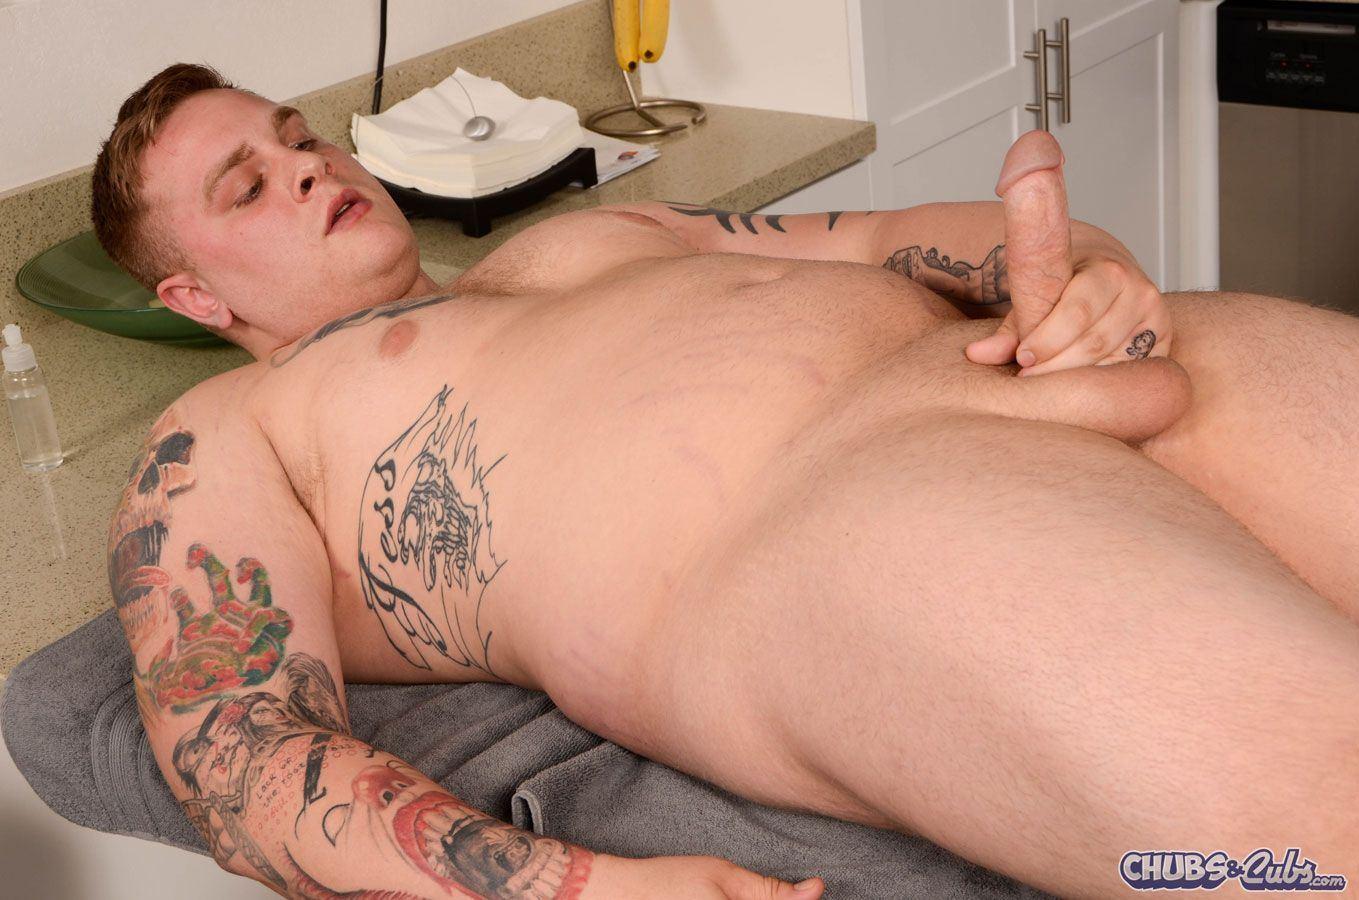 large tits girl having sex video